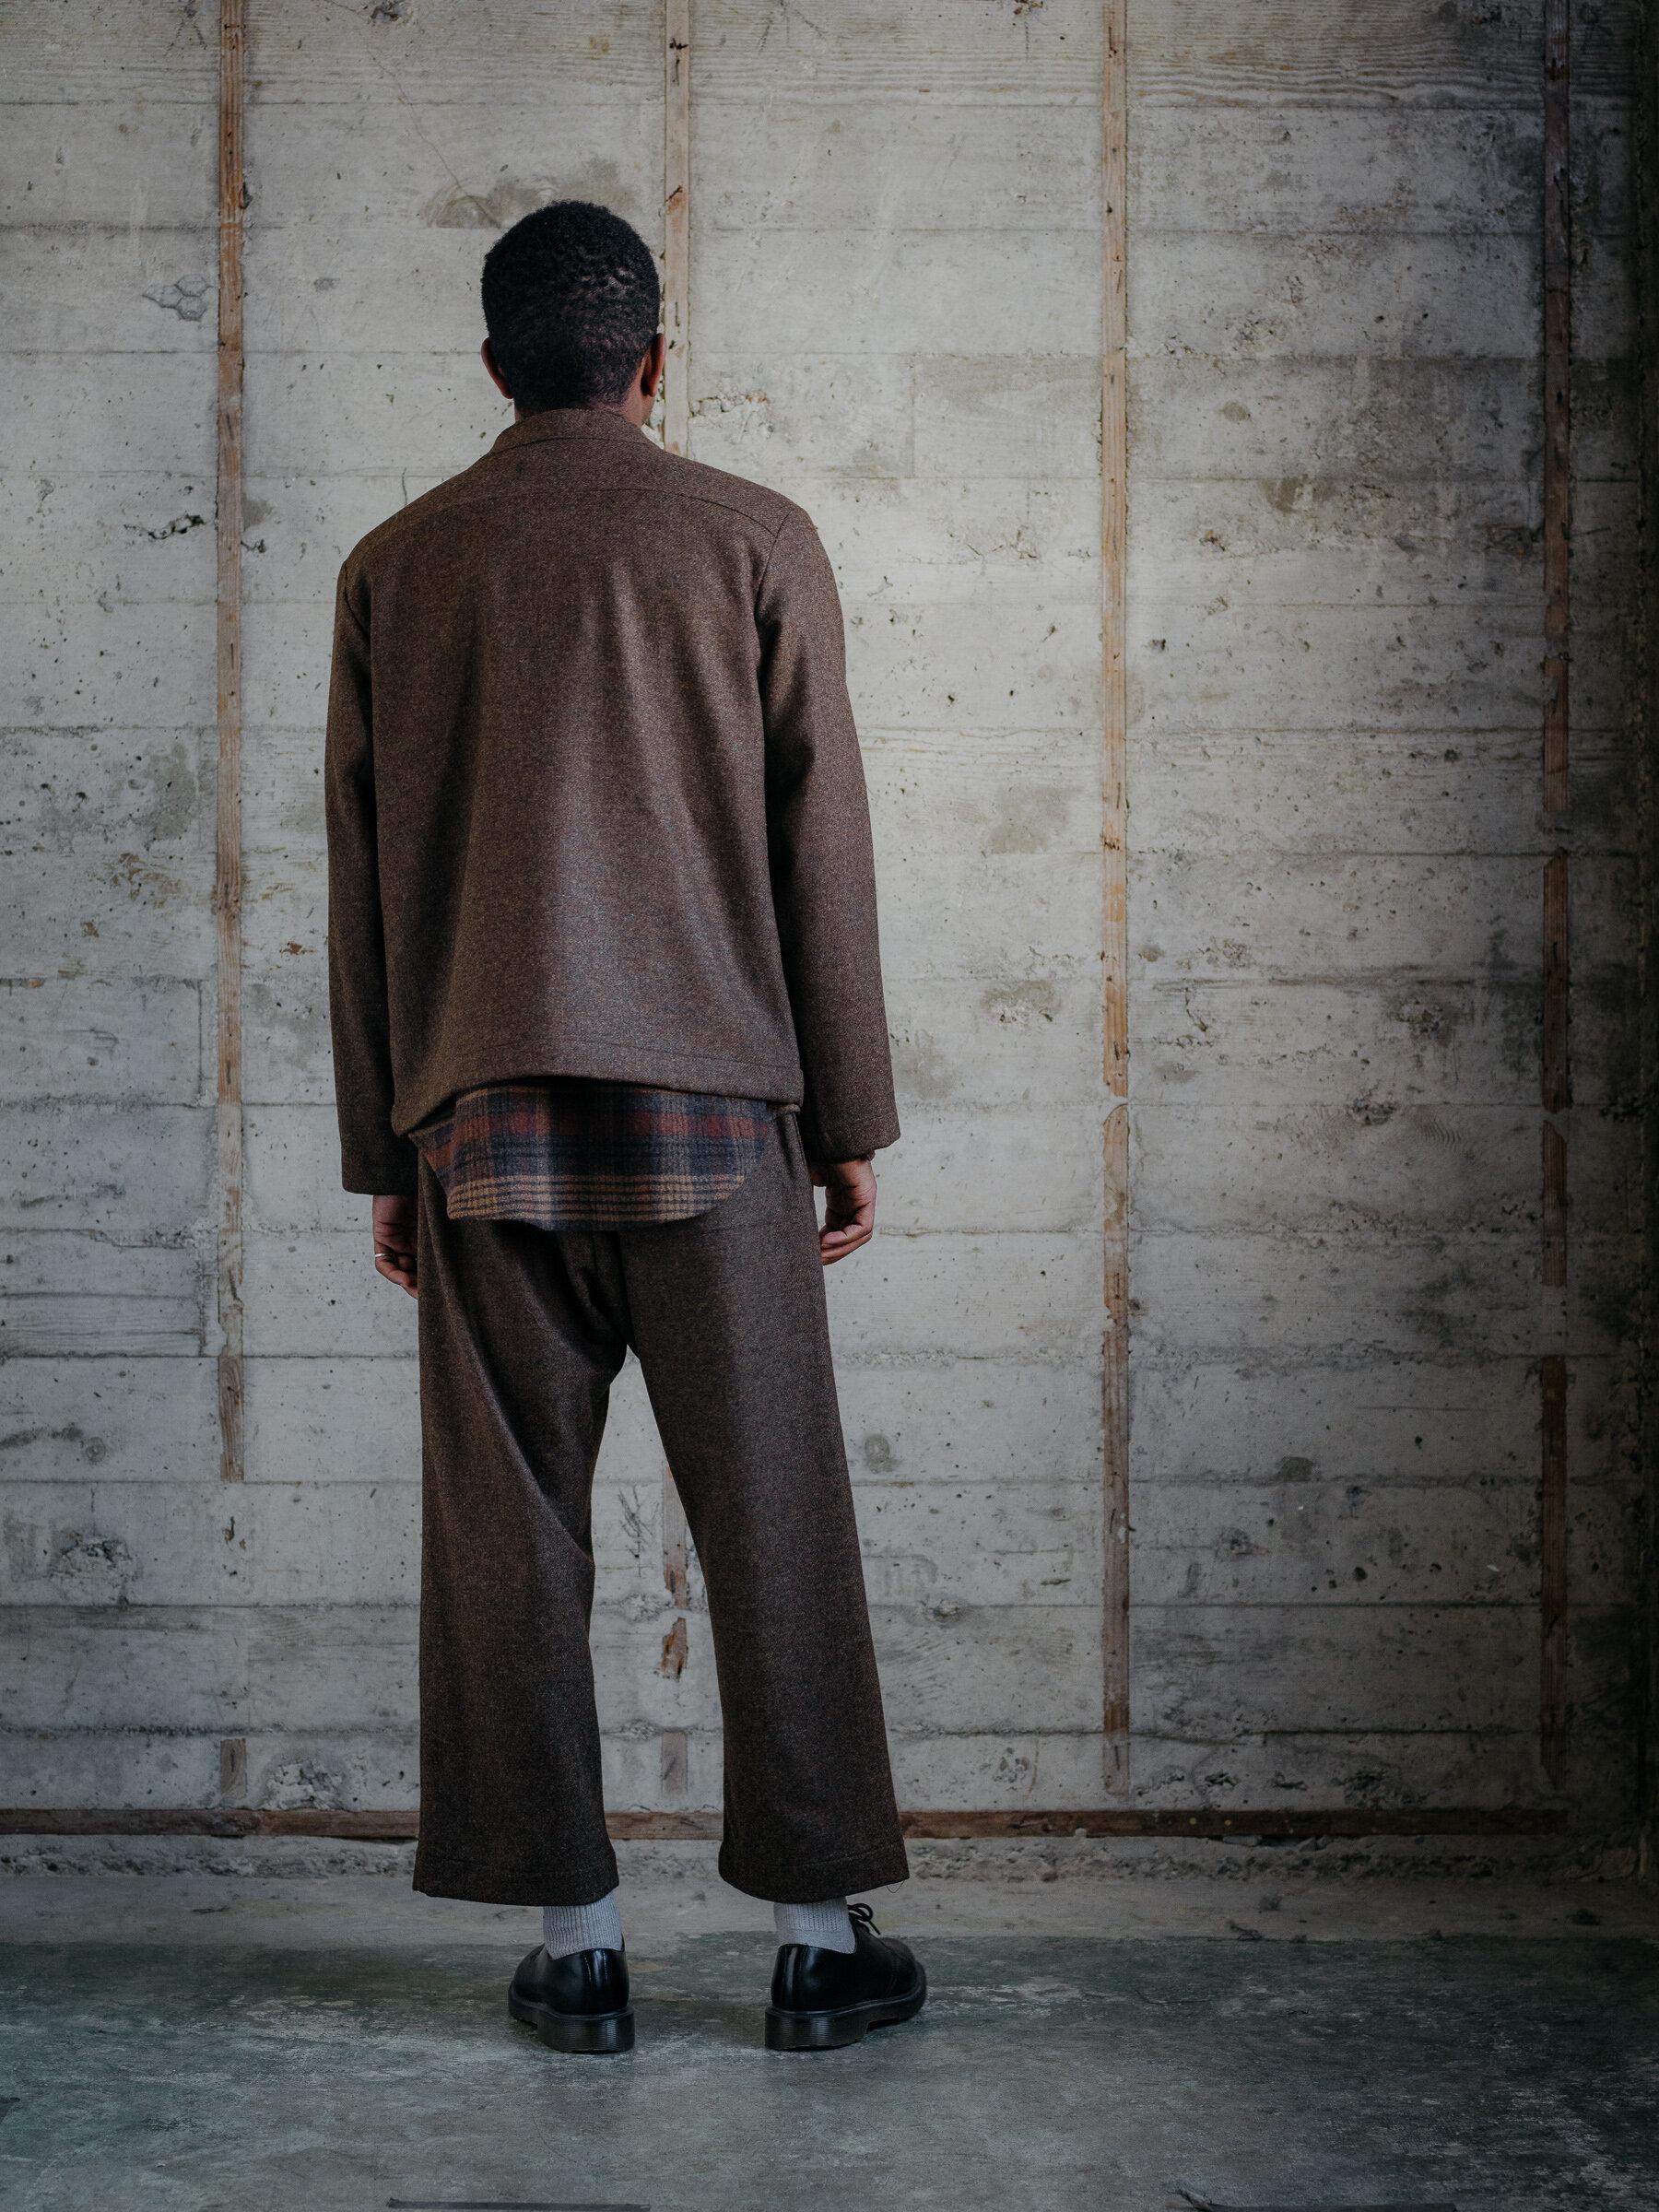 evan-kinori-pullover-rust-lambswool-wool-flannel-woven-in-england-3